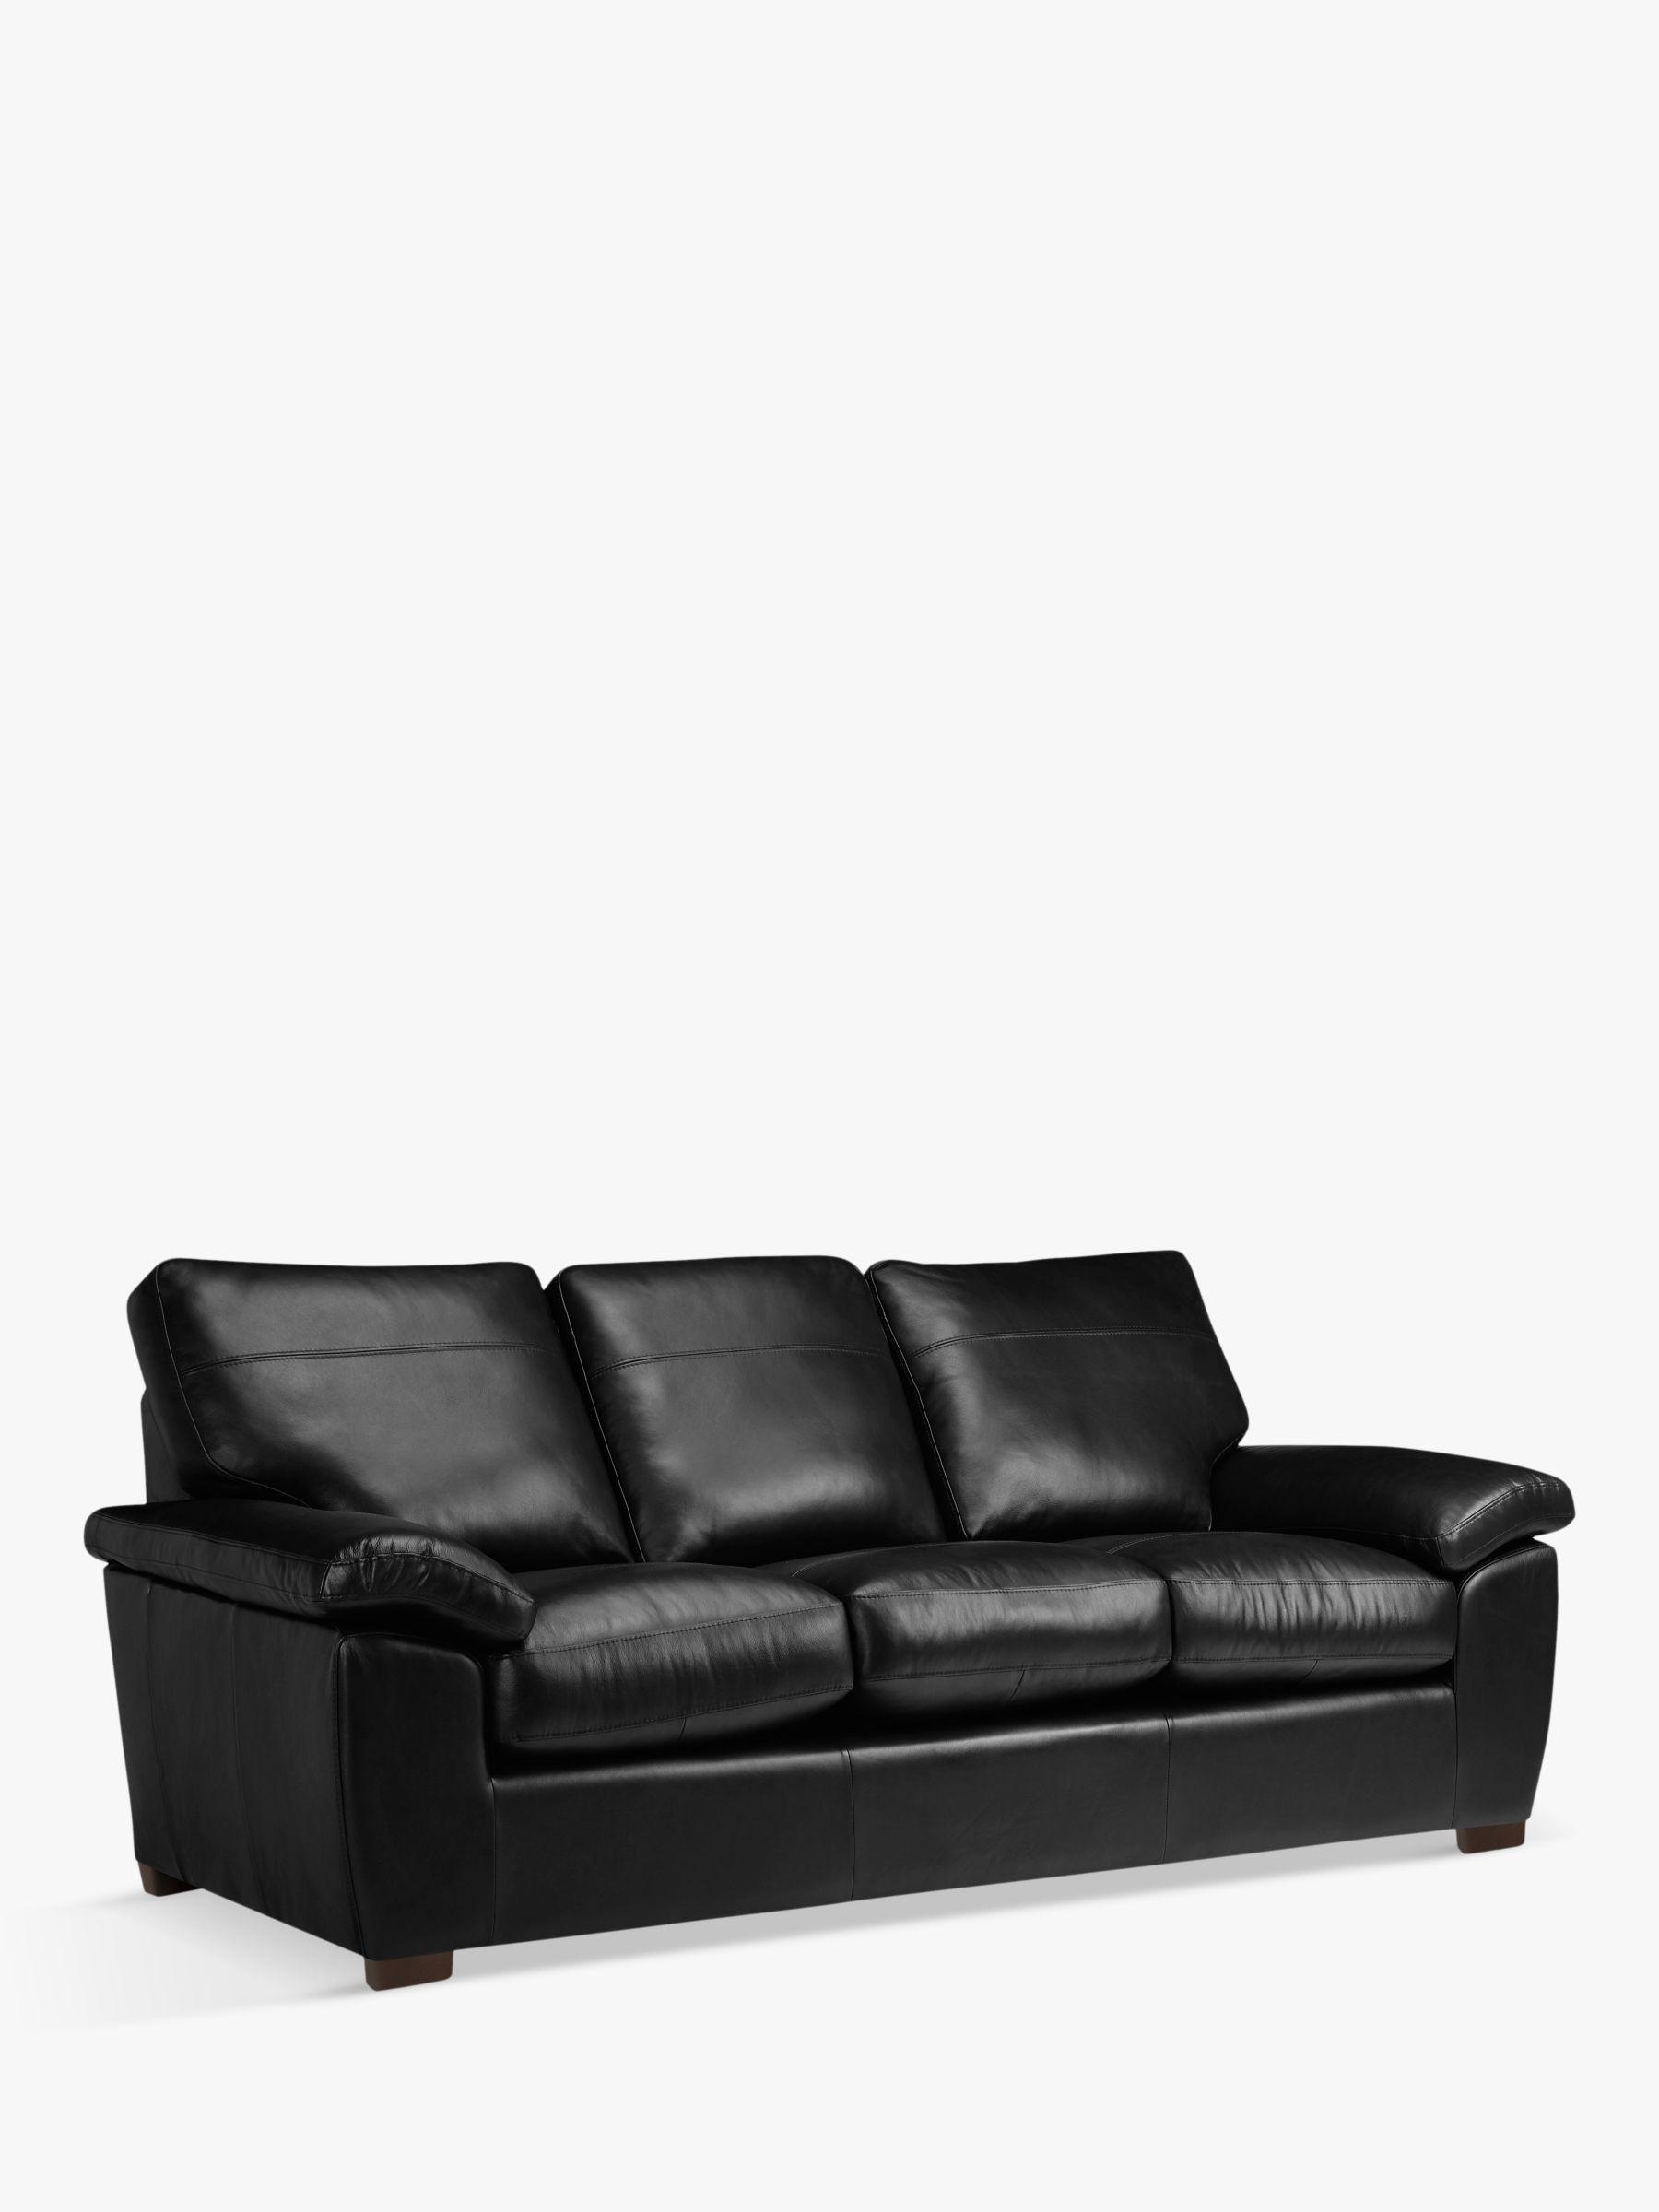 camden sofa john lewis red and black cushions partners grand 4 seater dark leg